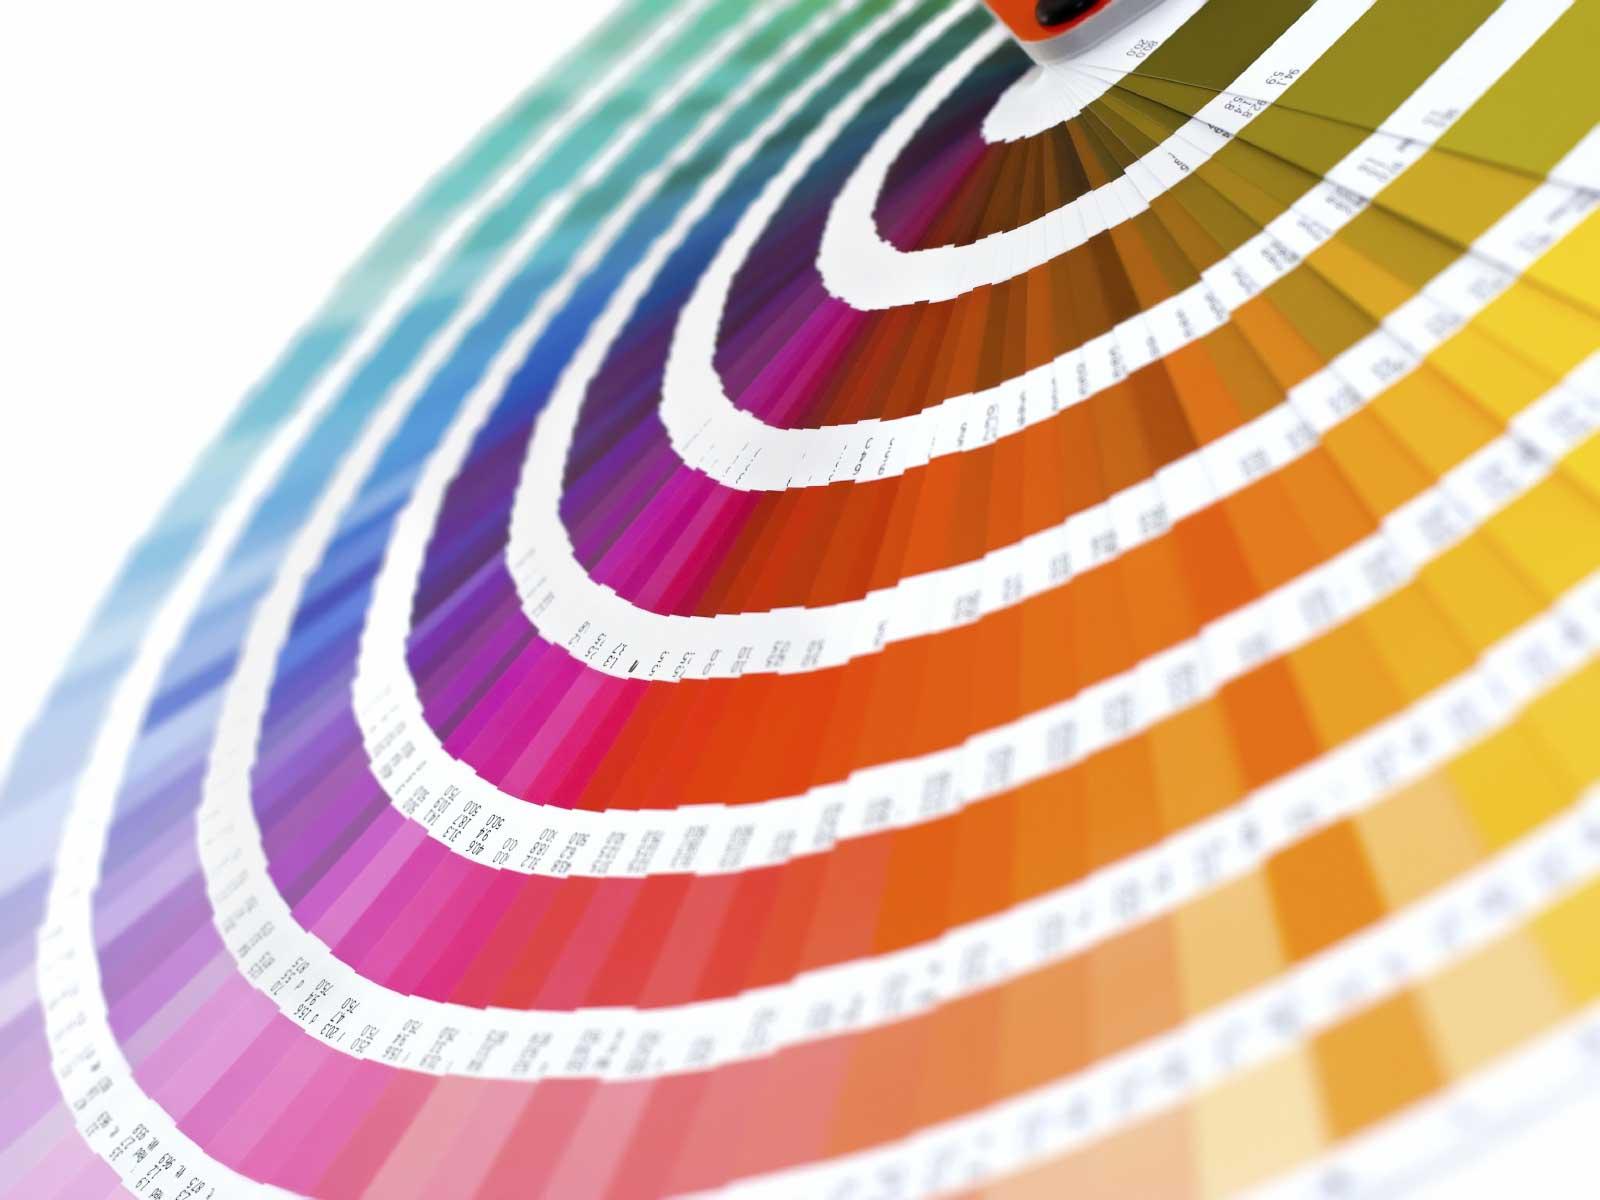 Ifixdisseny Espacios De Color Rgb Cmyk Lab Hsb Etc